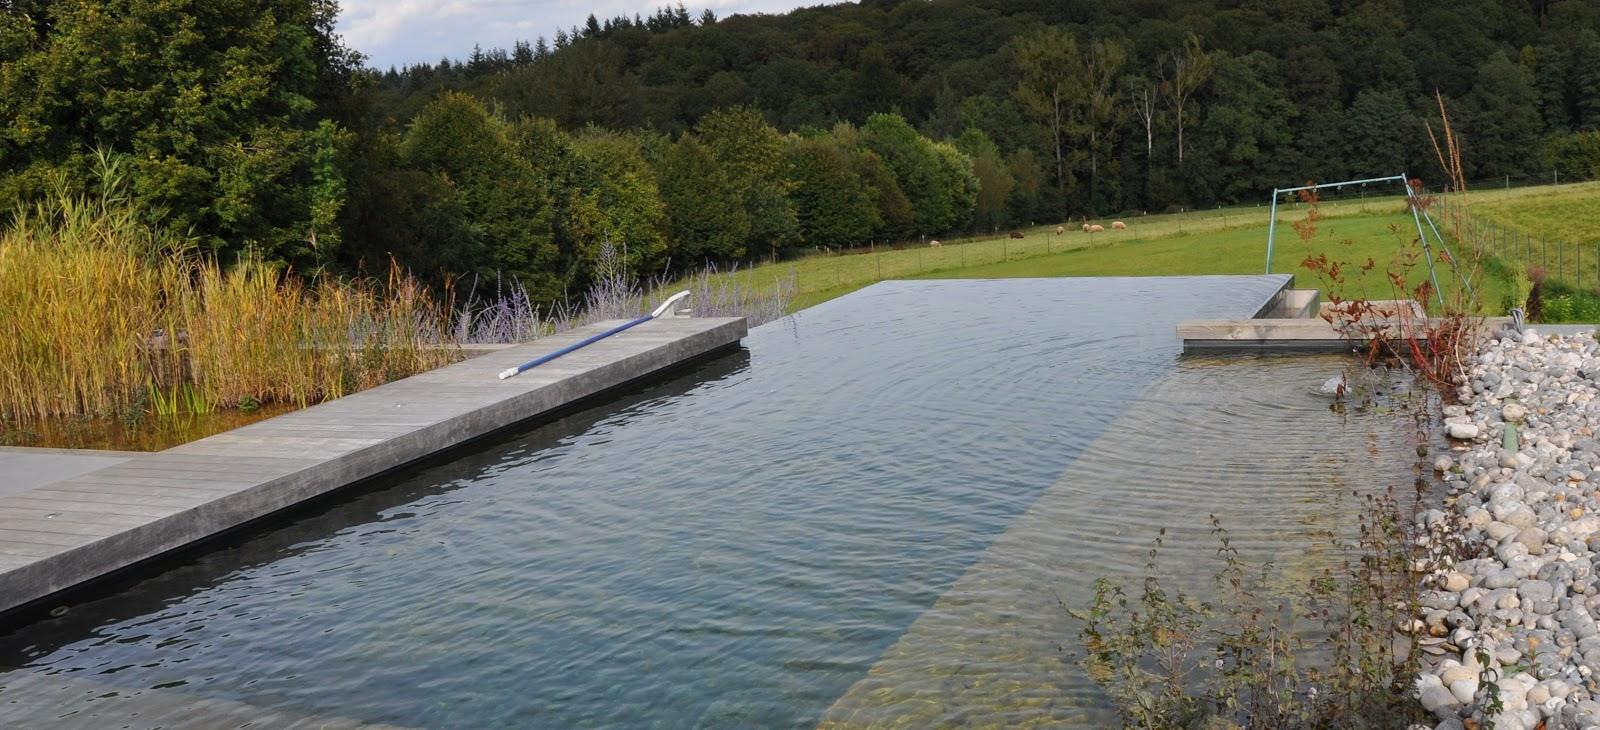 Baln aris baignades naturelles bioteich piscine for Piscine naturelle a debordement